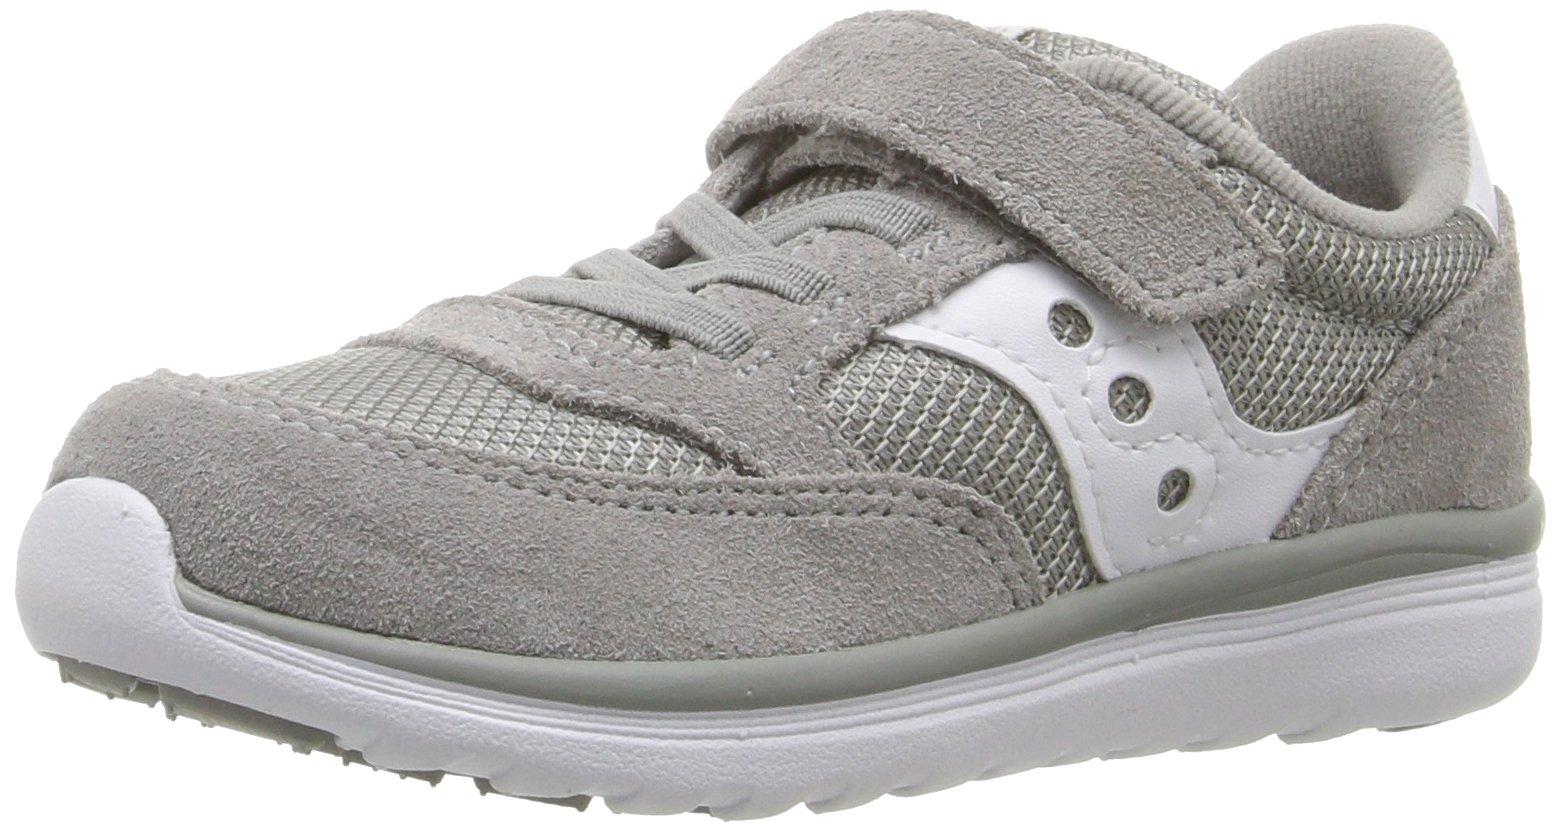 Saucony Baby Jazz Lite Sneaker (Toddler/Little Kid/Big Kid), Grey/White, 9.5 W US Toddler